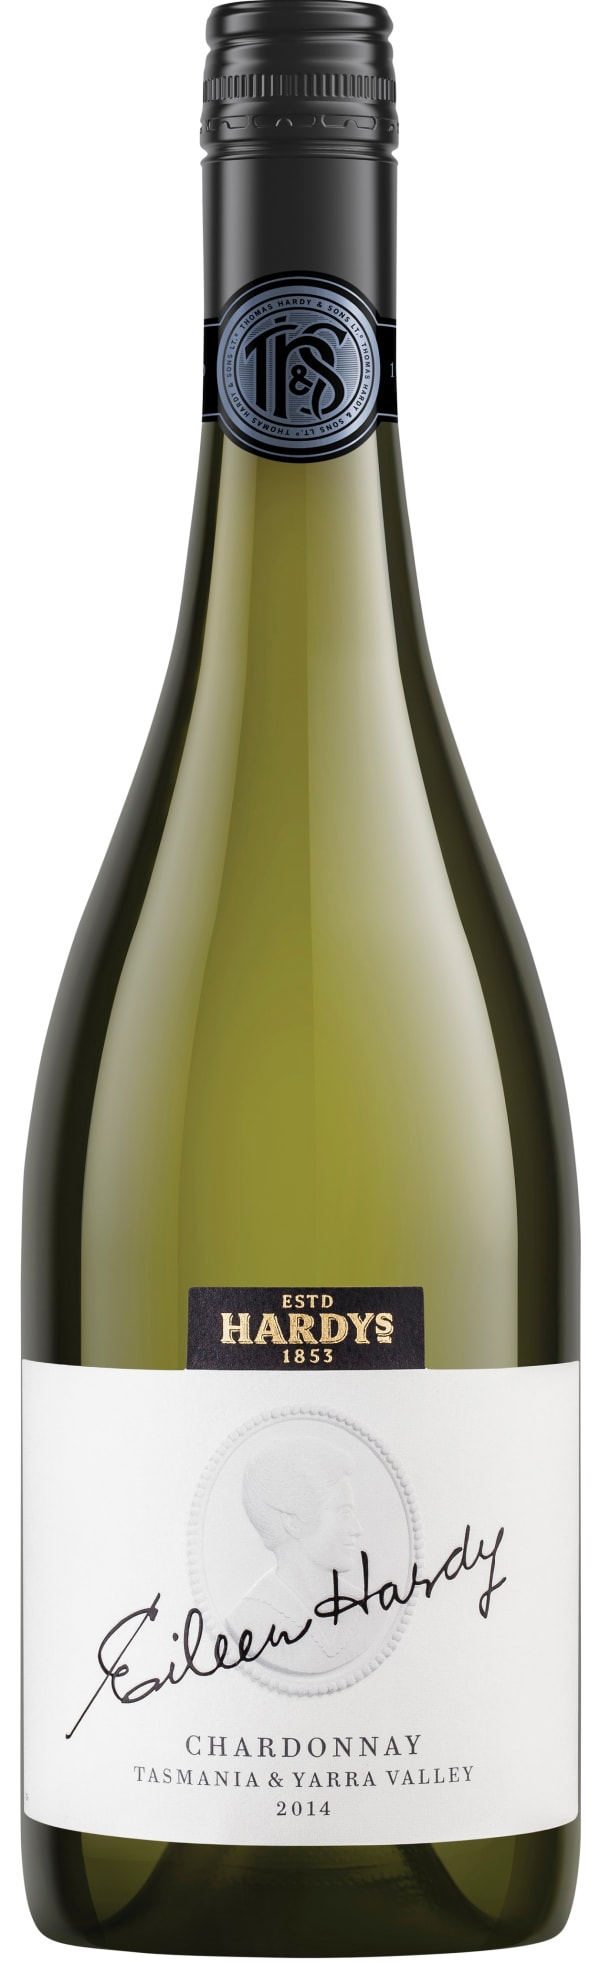 Hardy's Eileen Hardy Chardonnay 2014